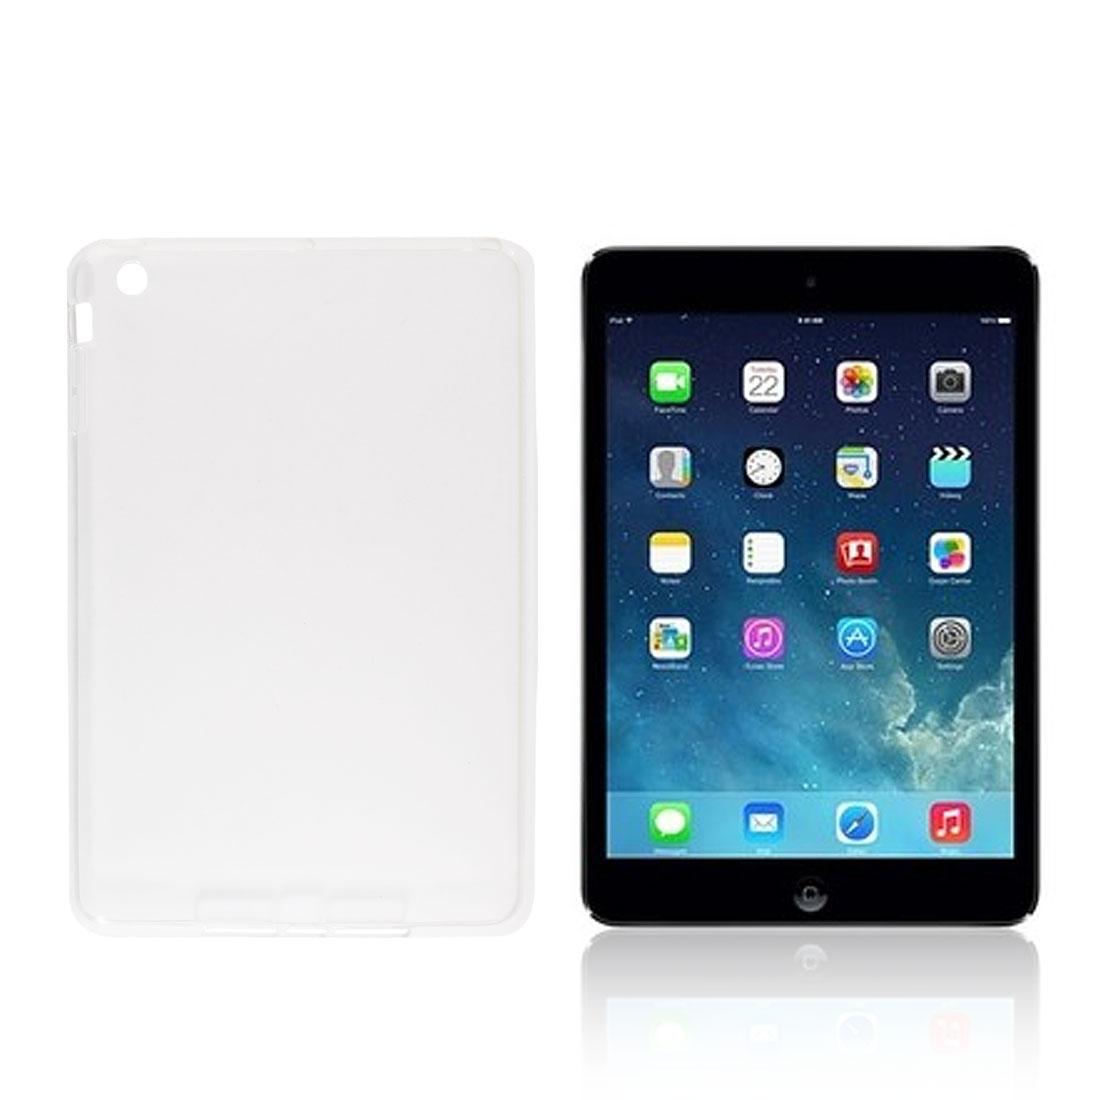 Clear TPU Soft Plastic Protector Back Case Cover for iPad Mini 1 2